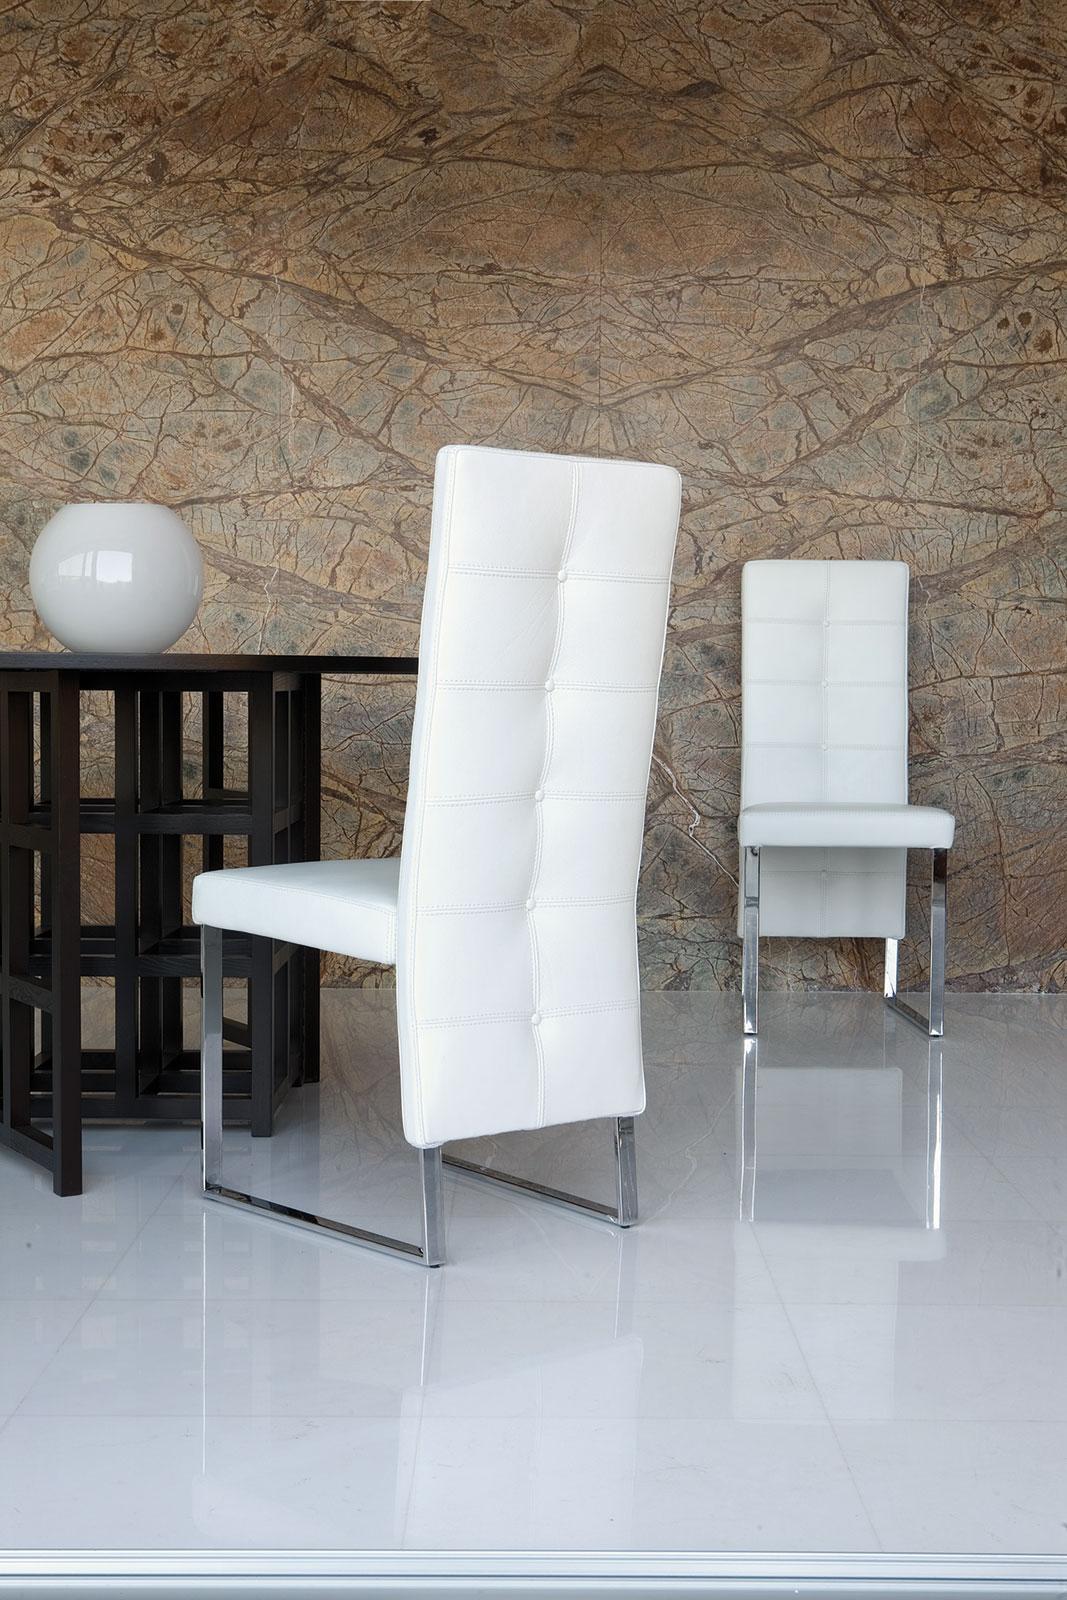 Nizza sedia imbottita schienale alto italy dream design for Sedia design schienale alto